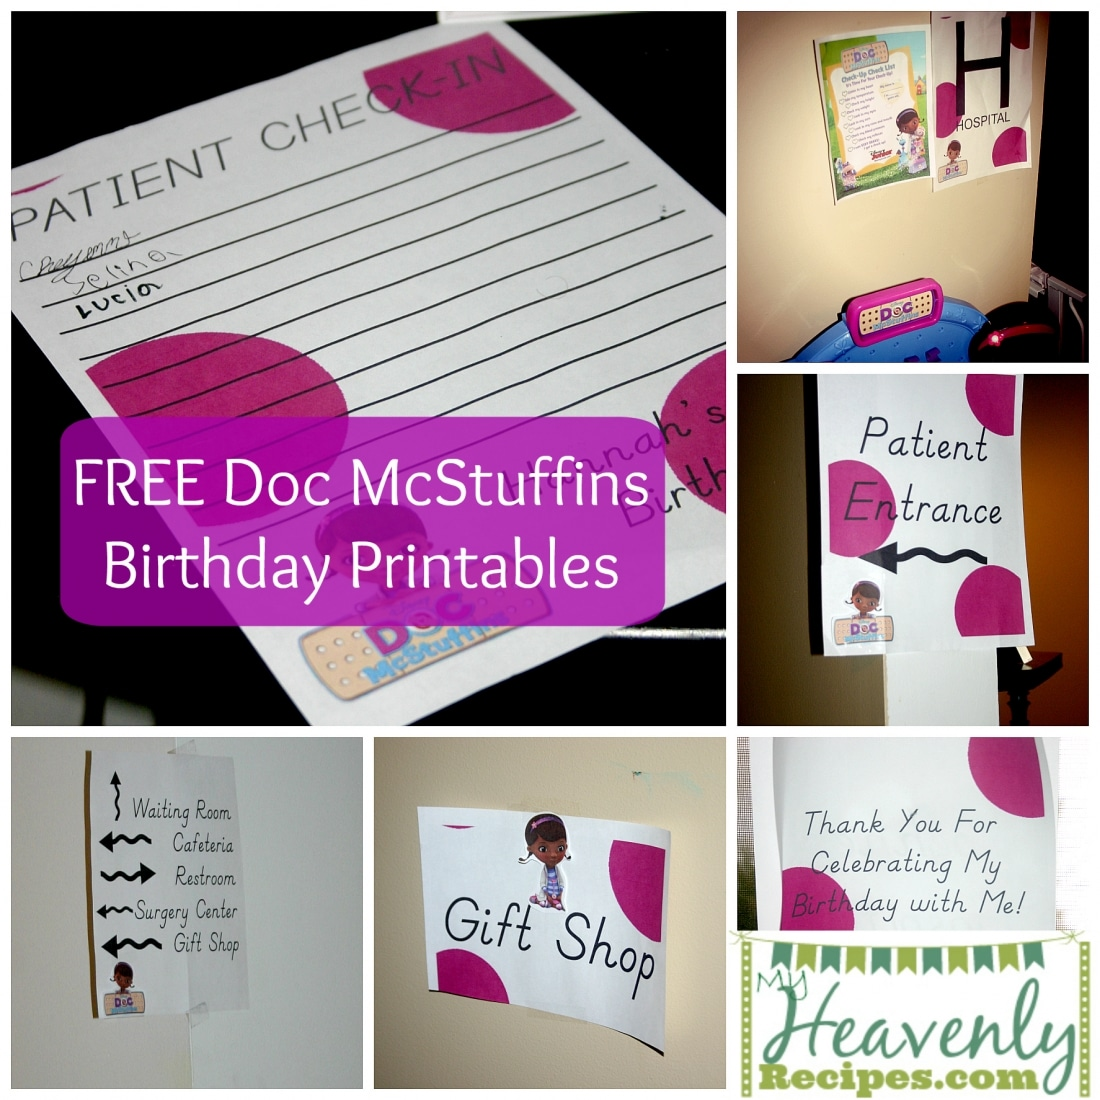 Free Doc McStuffins Birthday Printables